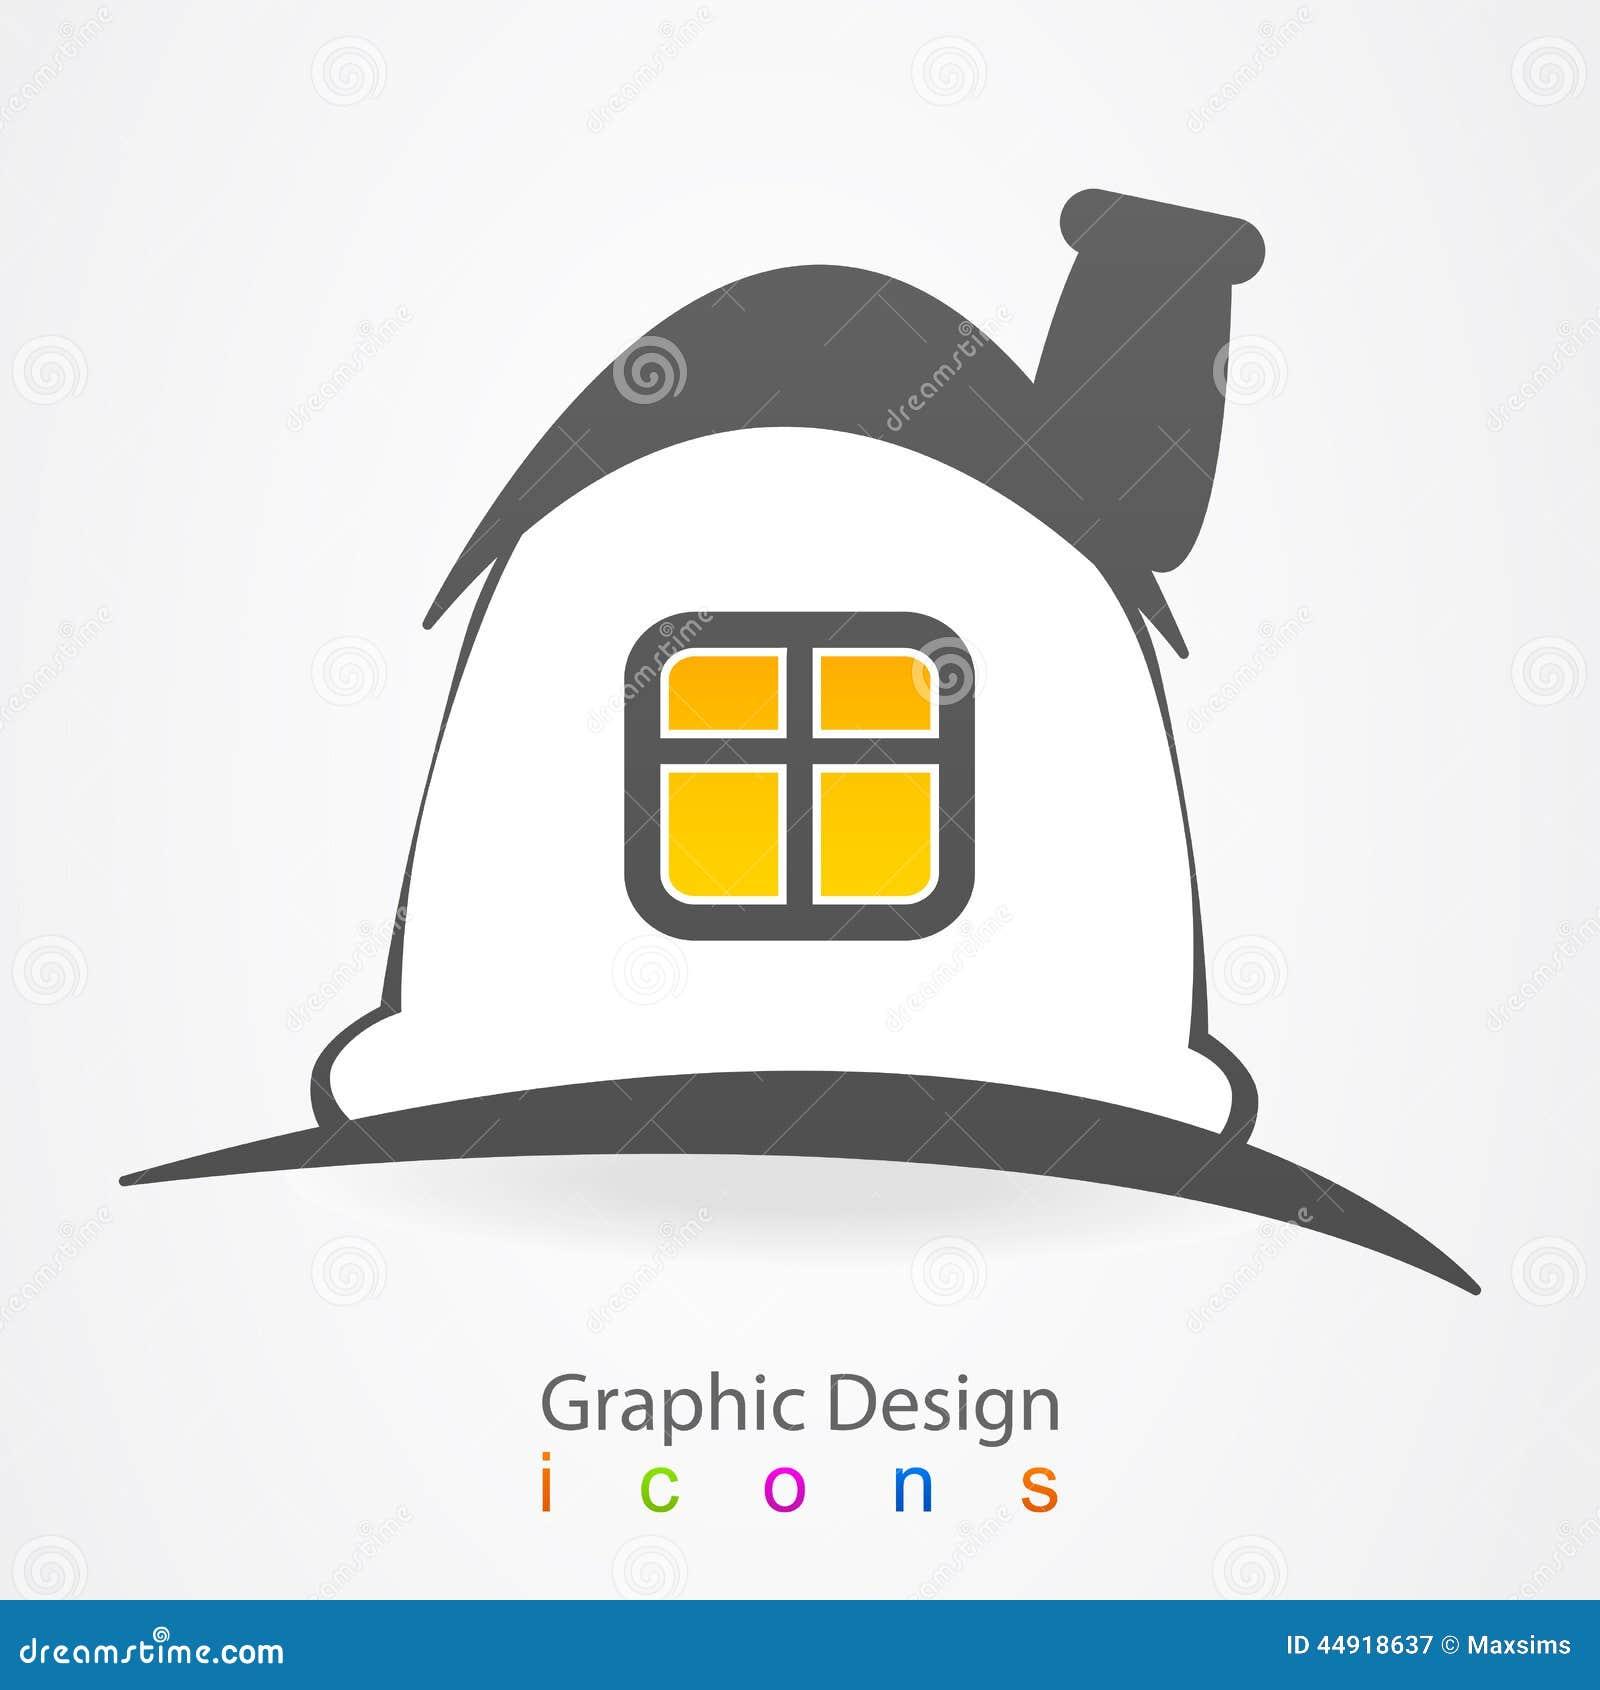 Graphic Design House Magic Logo Icon Stock Photo Image